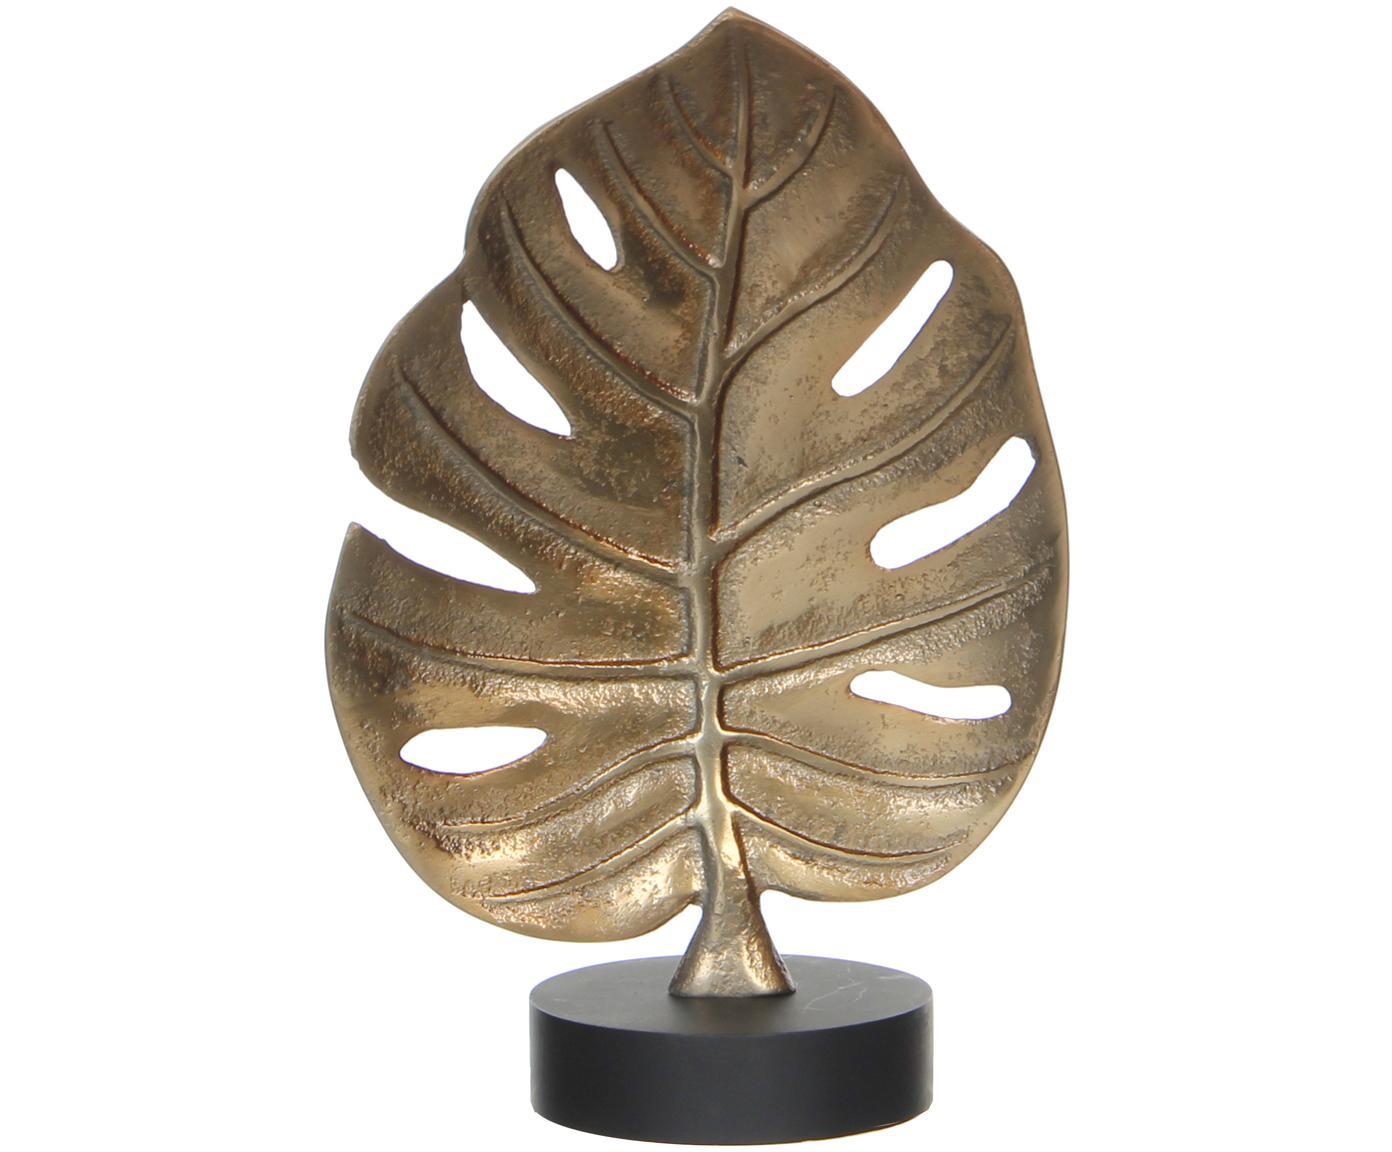 Deko-Objekt Blatt, Fuß: Aluminium, beschichtet, Deko-Objekt: GoldfarbenFuß: Schwarz, 19 x 25 cm